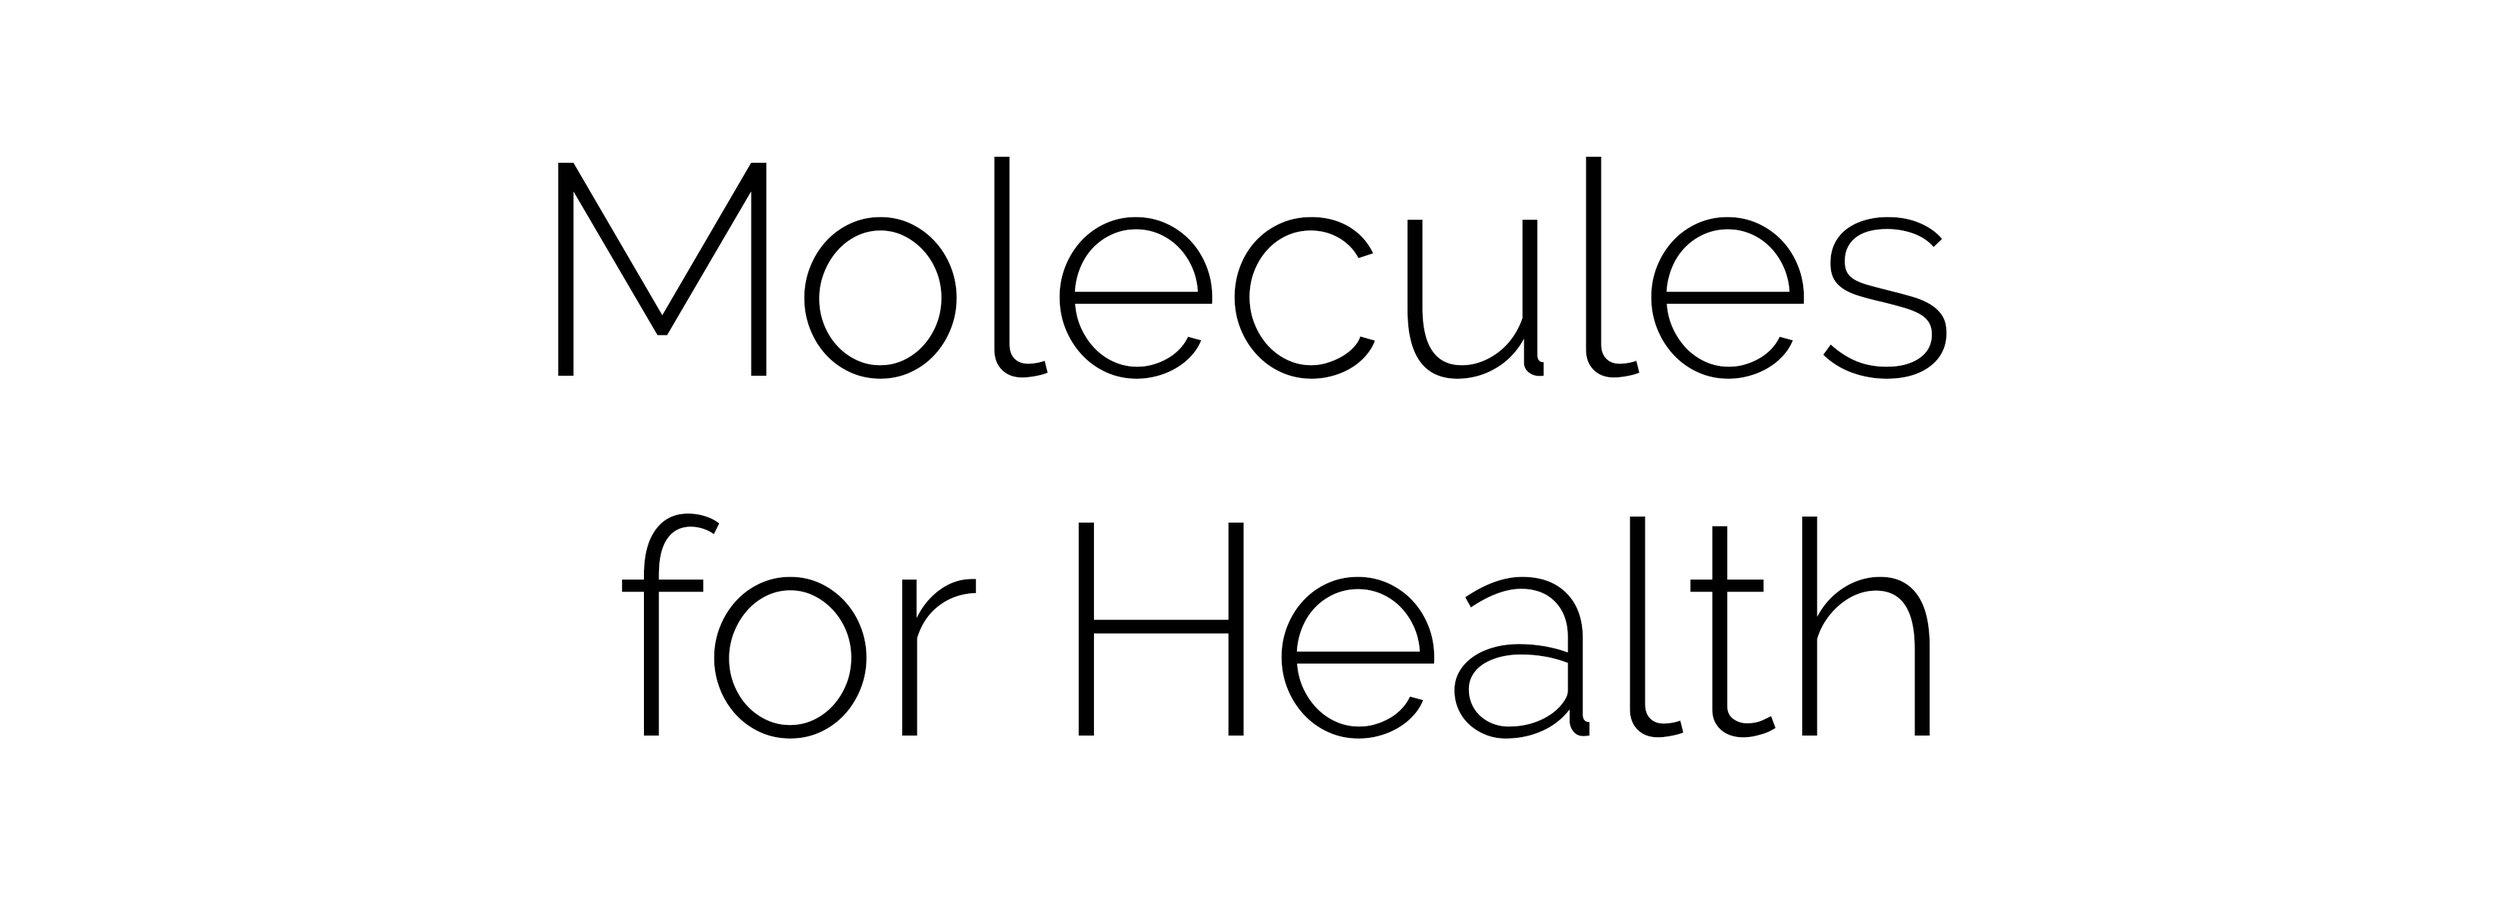 Molecules for Health.jpg